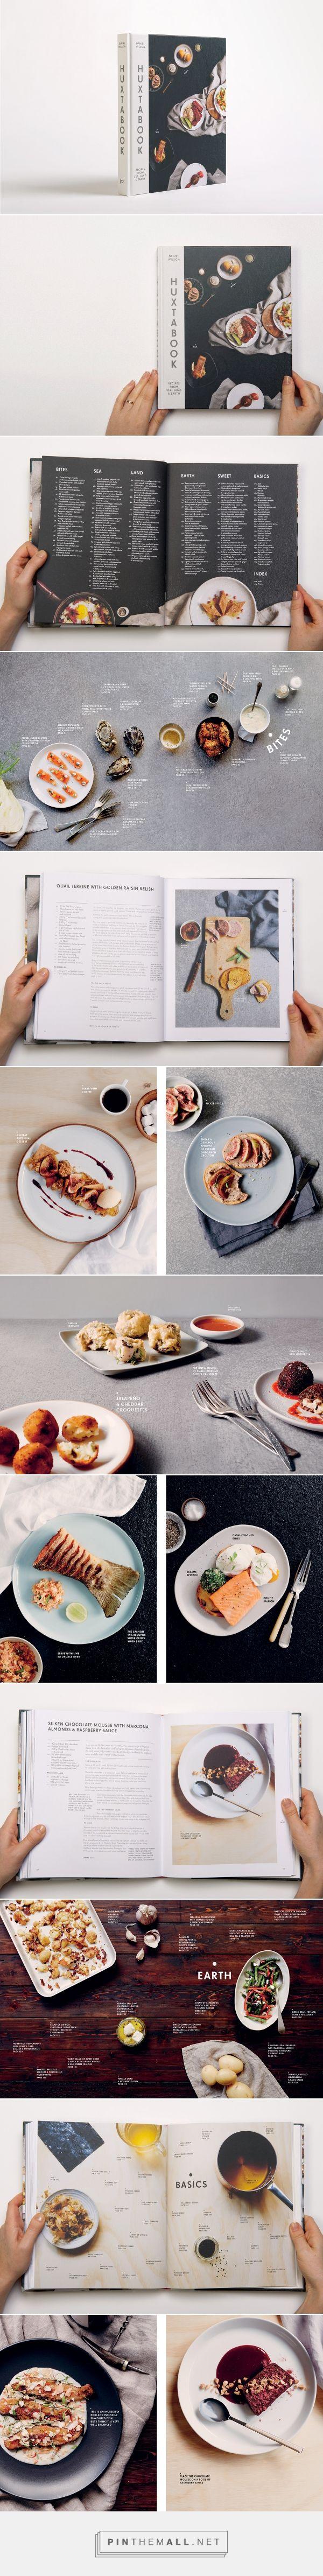 Cookbook editorial design, food phography